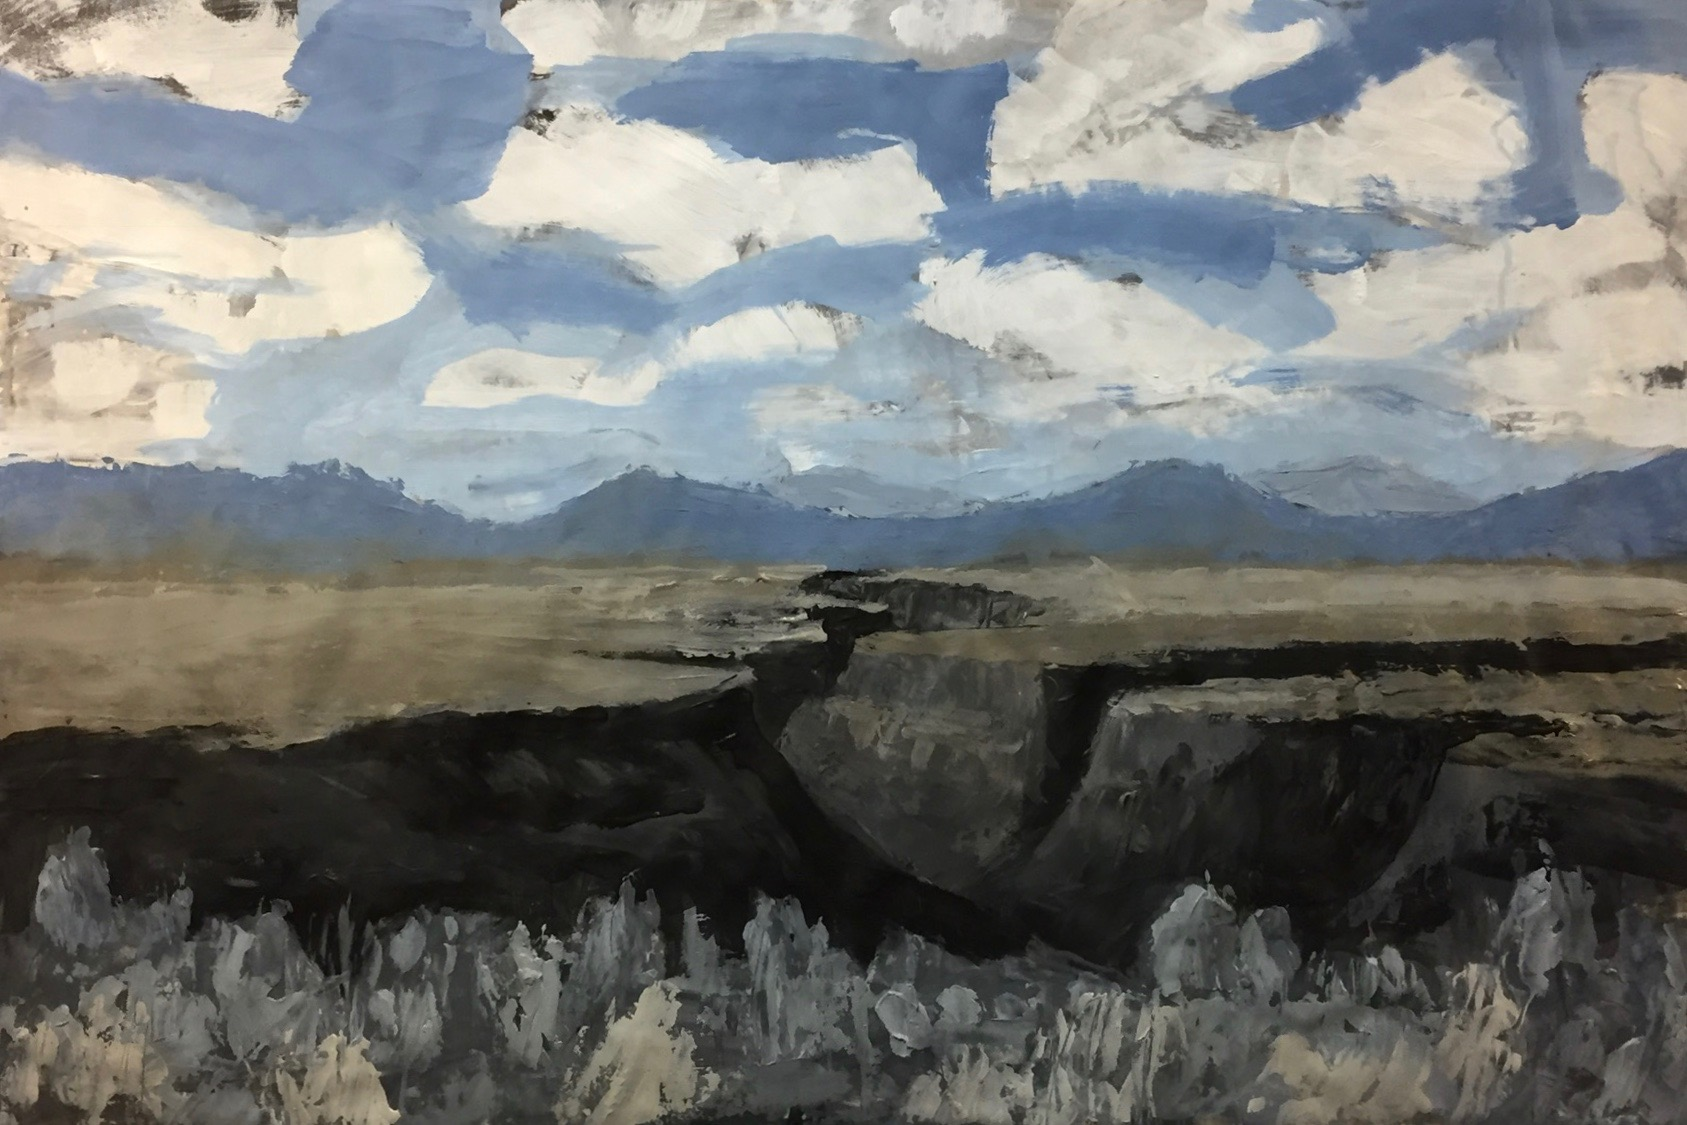 Taos No. 1